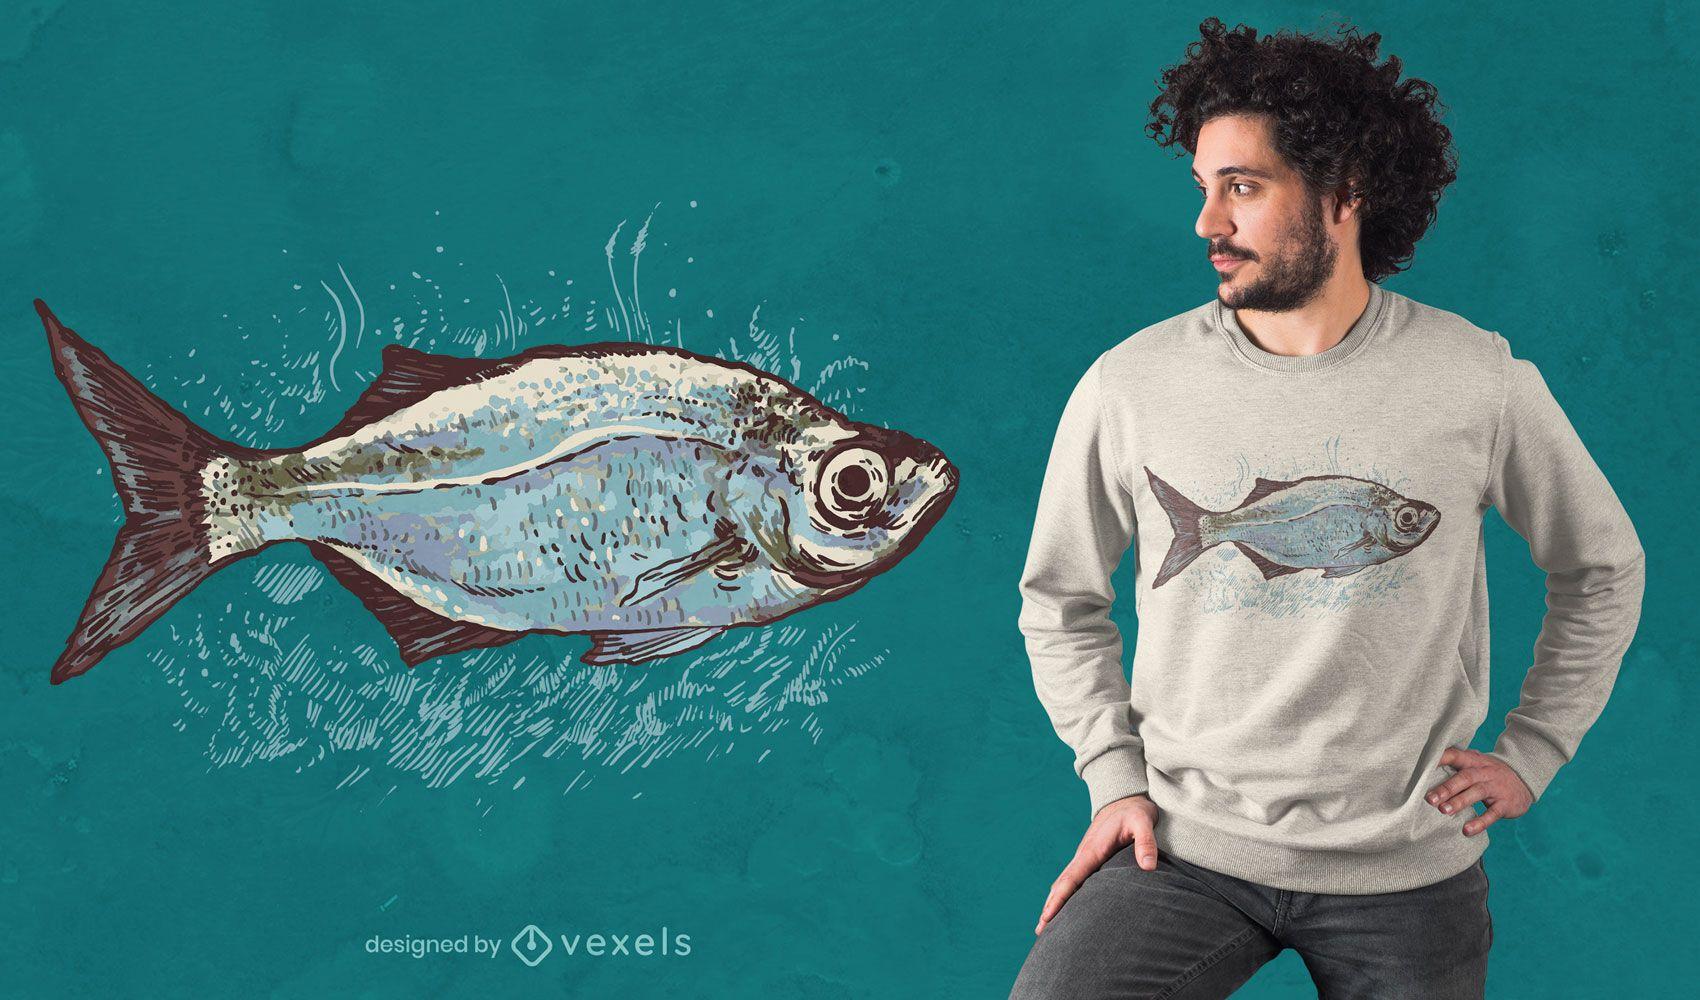 Hand-drawn fish t-shirt design